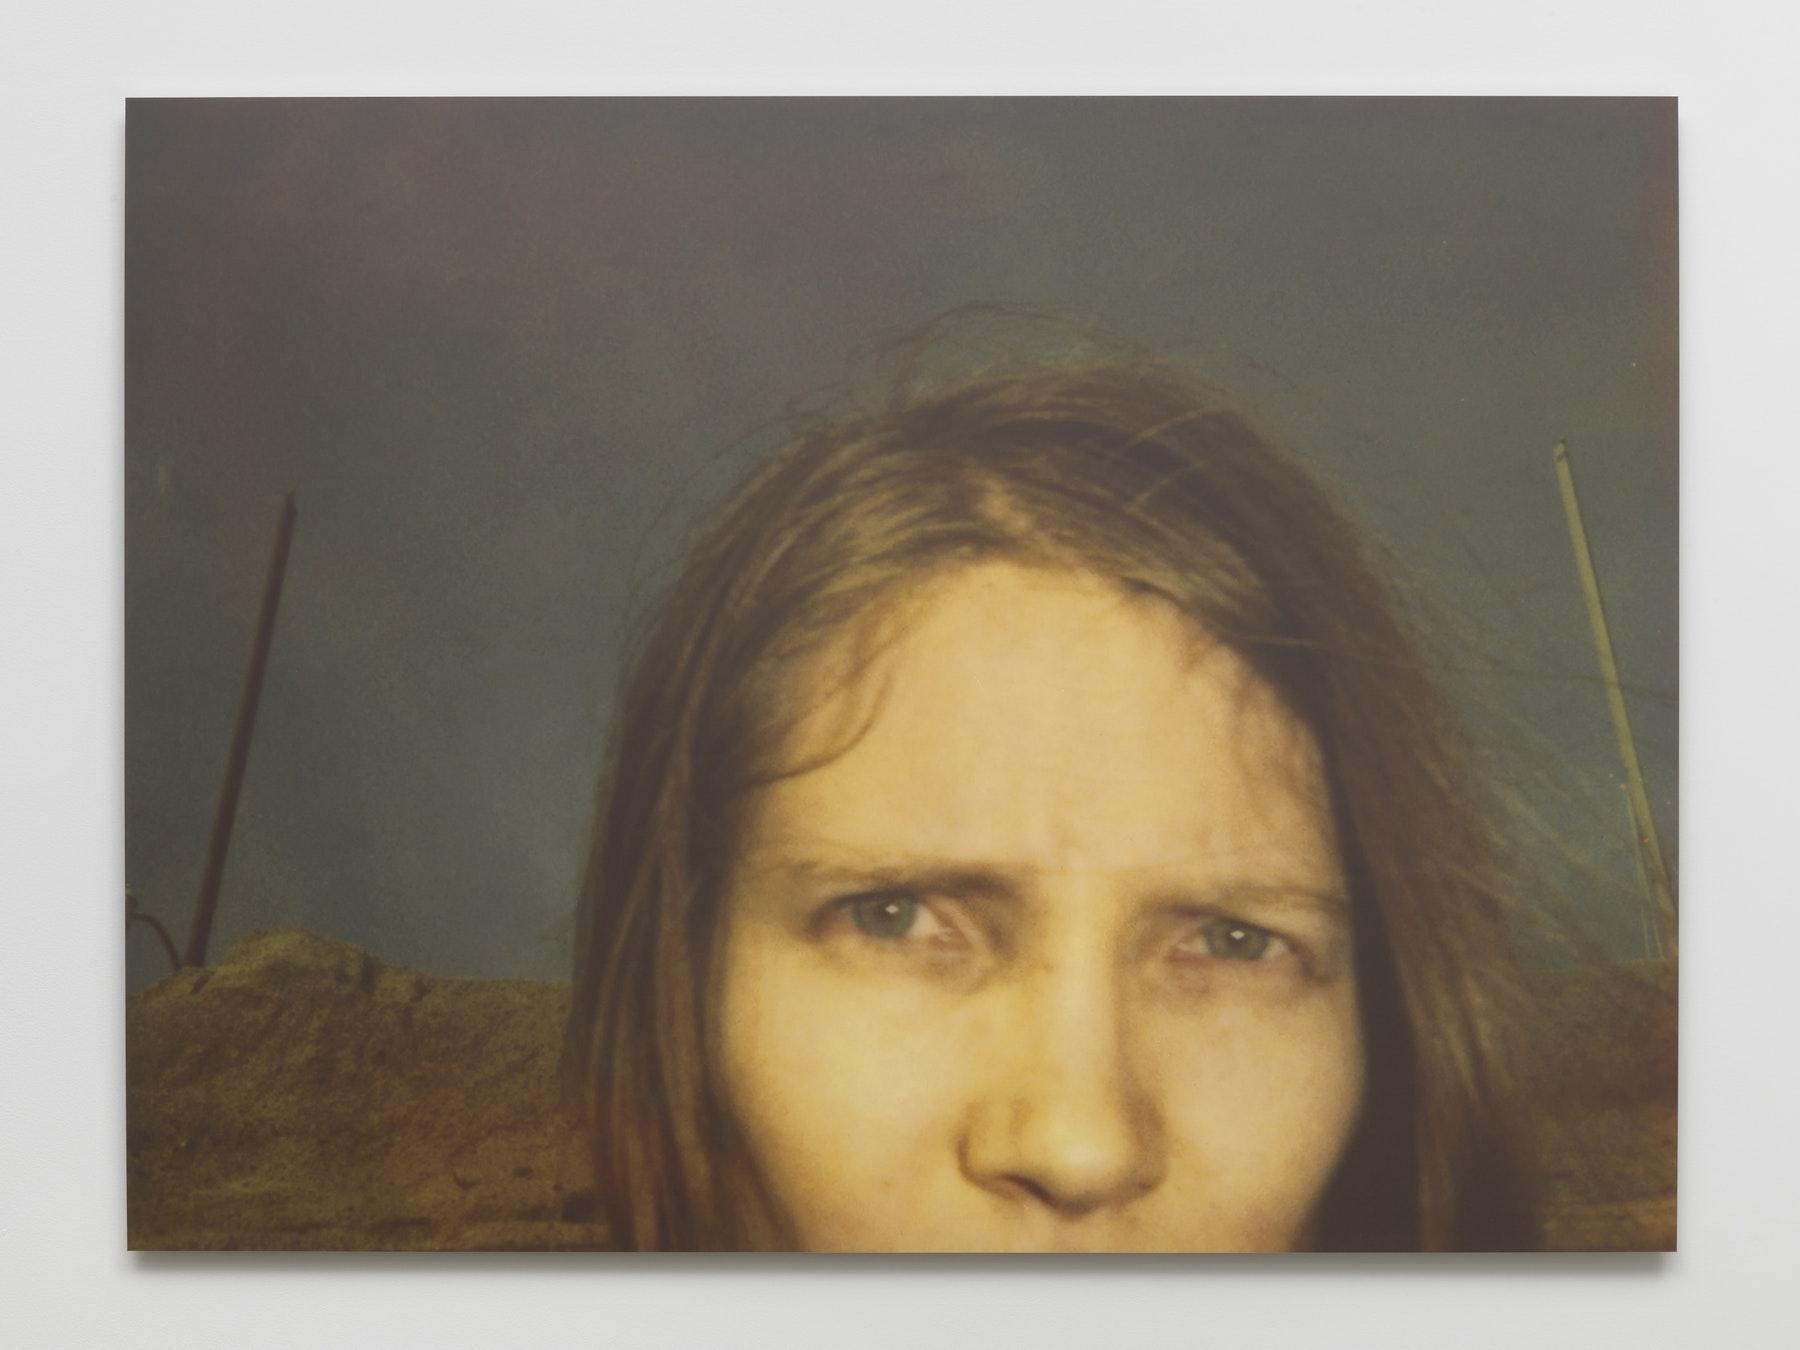 "Stefanie Schneider ""california blue screen (stranger than paradise),"" 1997 / 2020 Digital C-Print, based on a Polaroid 40 x 53.75 x 1"" [HxWxD] (101.6 x 136.52 x 2.54 cm) Edition 1 of 10, 2 AP Inventory #SCH1000.01 Photo credit: Robert Wedemeyer"